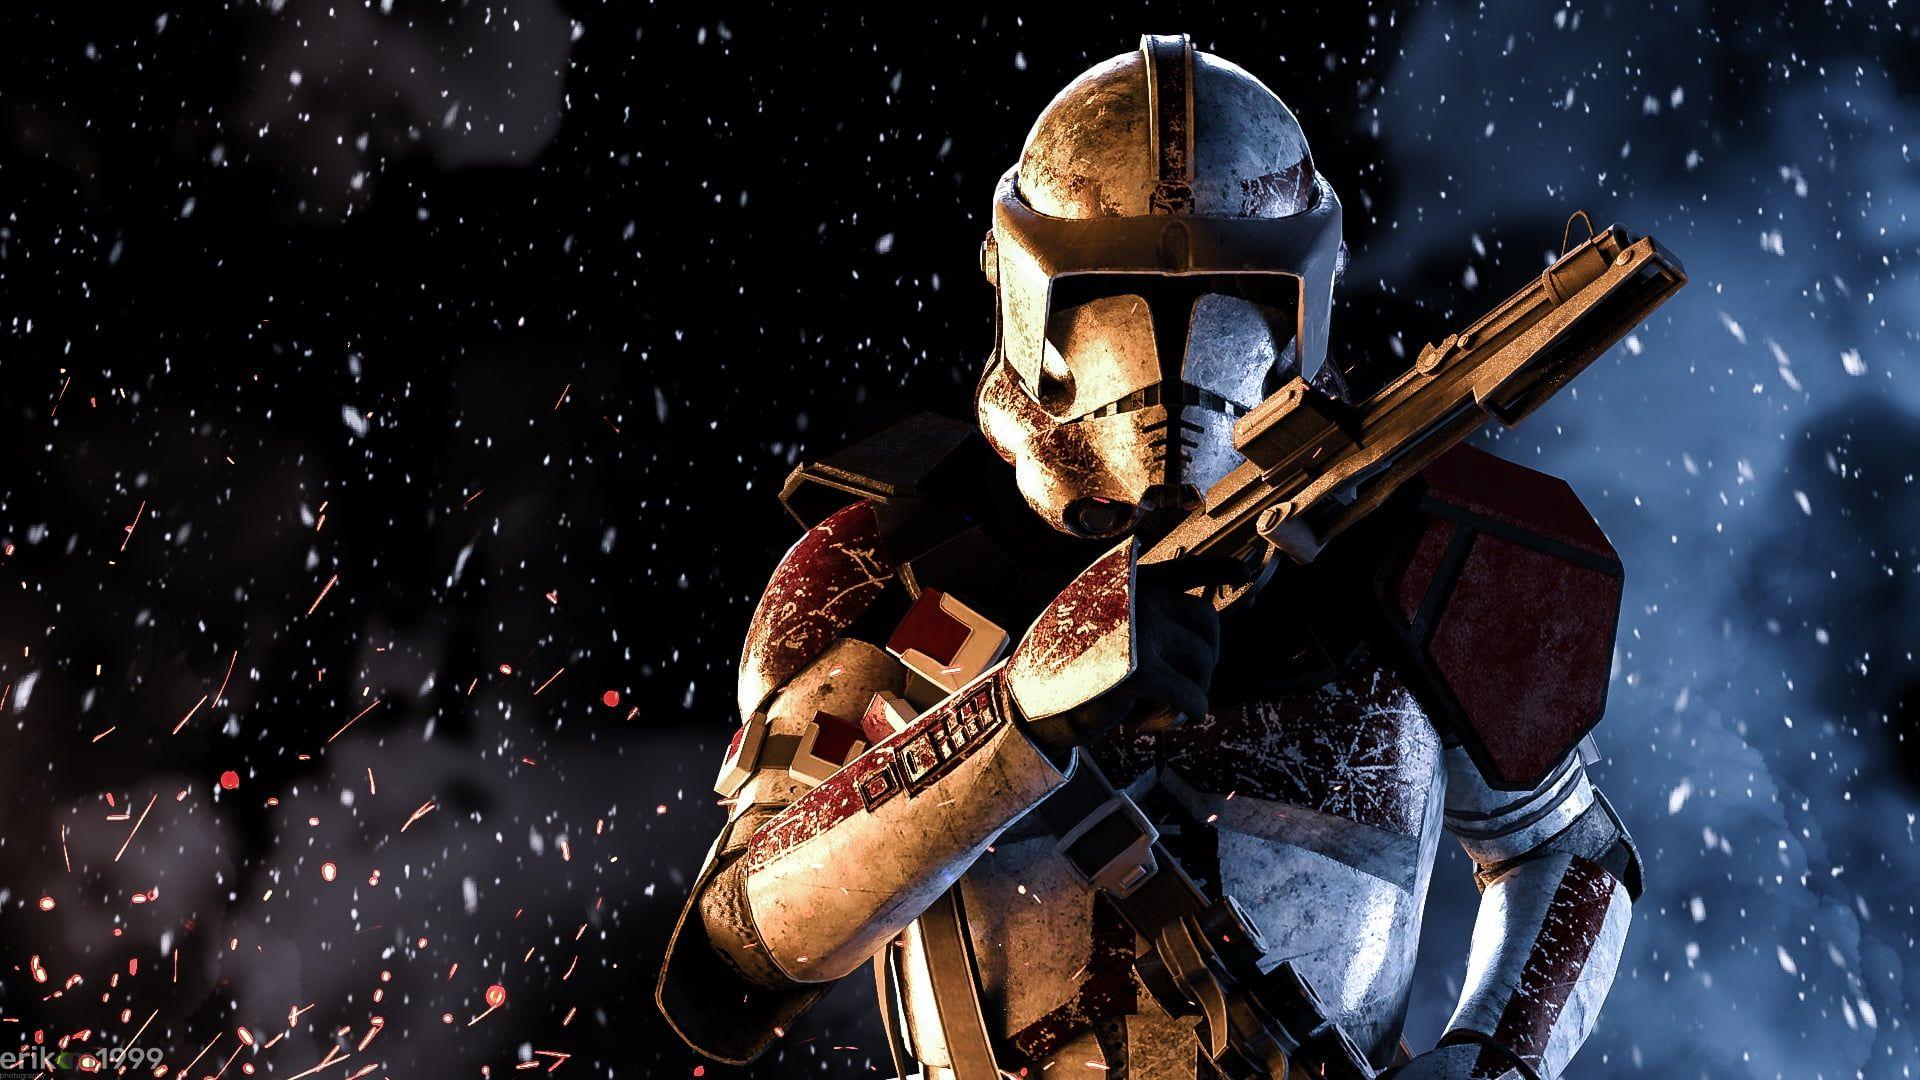 Star Wars Video Games Star Wars Battlefront Ii Star Wars Battlefront 2 Clone Trooper 1080p Wallpa In 2020 Star Wars Wallpaper Star Wars Images Funny Star Wars Memes